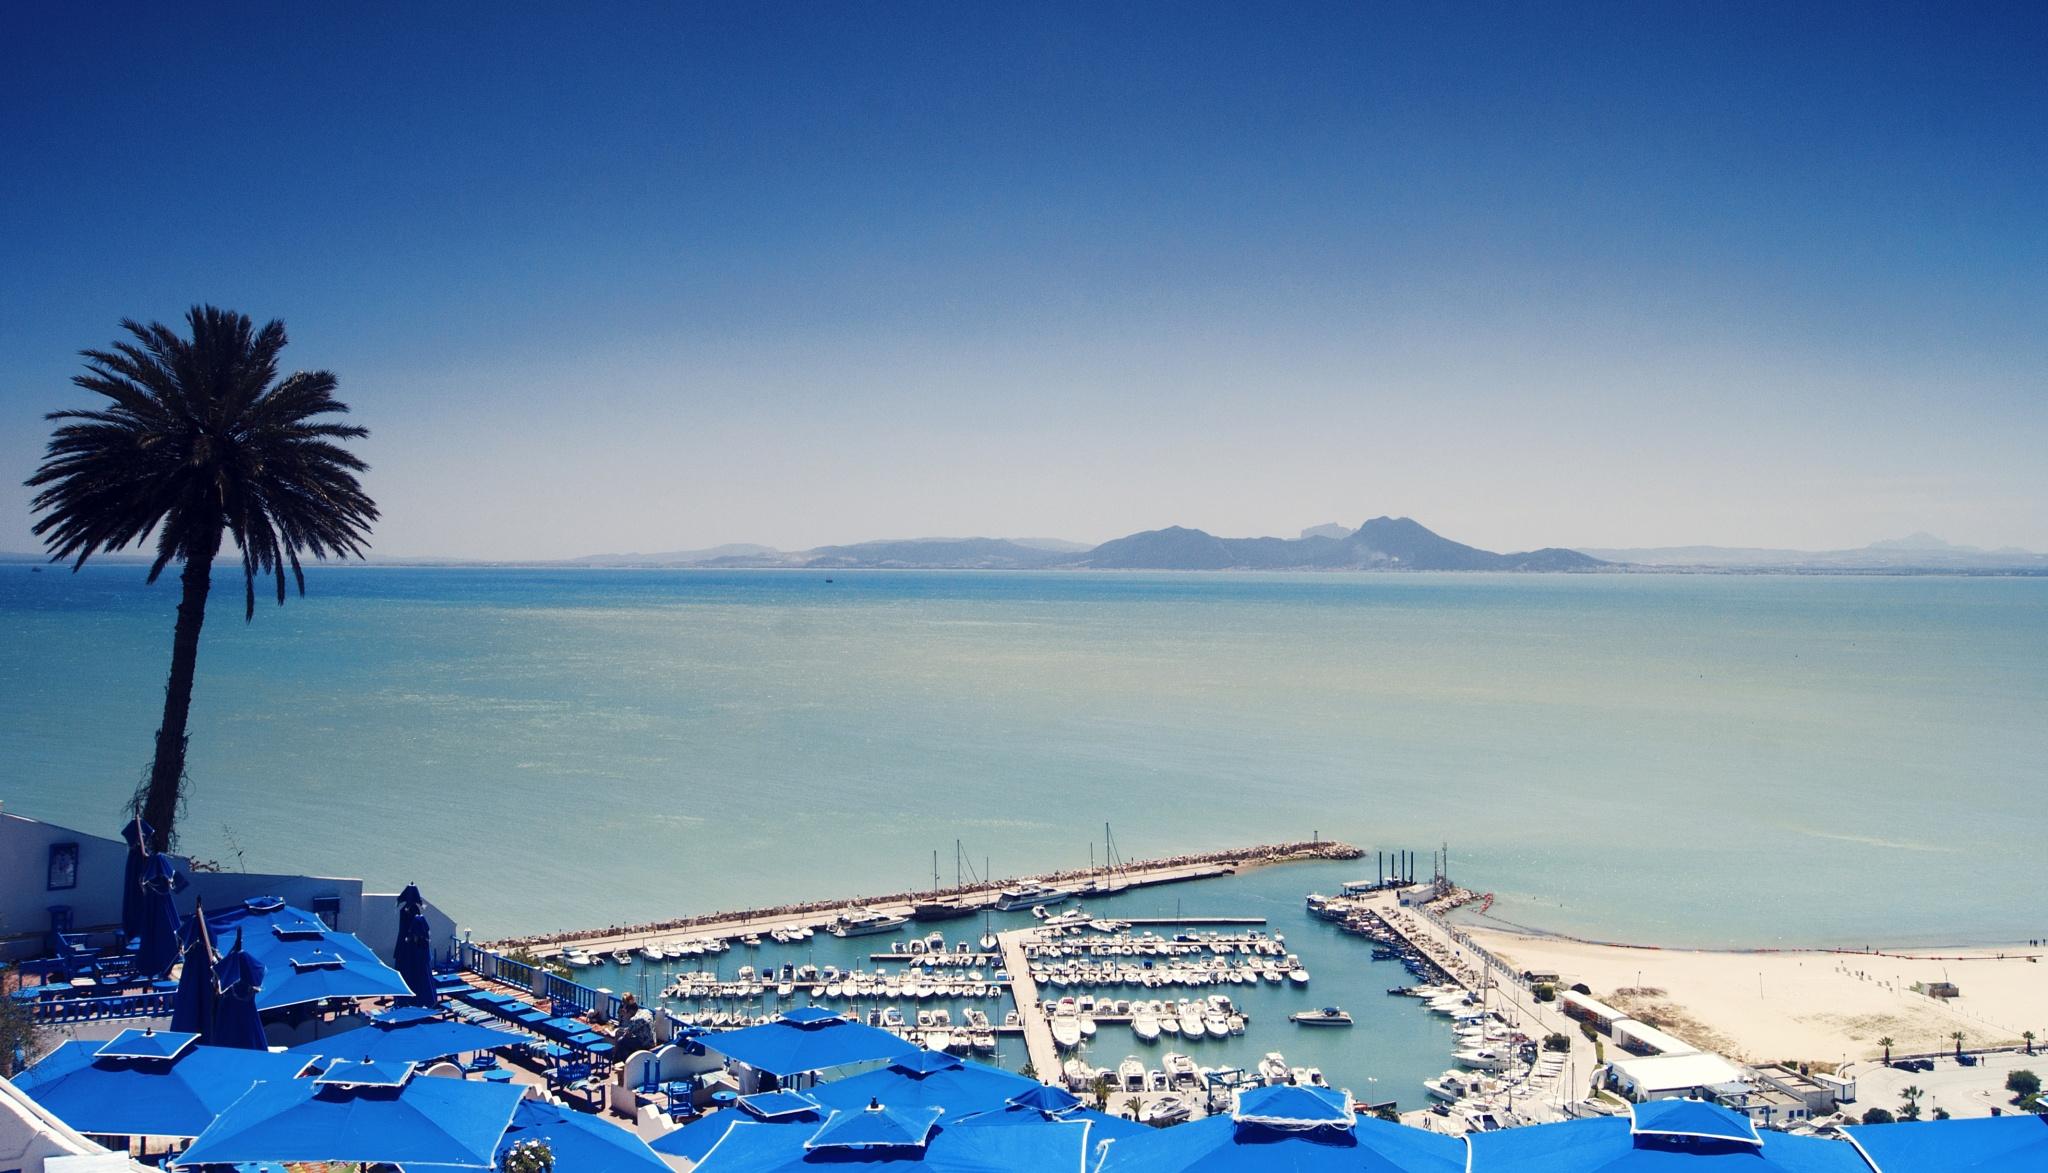 Romantic place in Tunisia. Sidi Bou Said by Vitaliy Barakovskiy